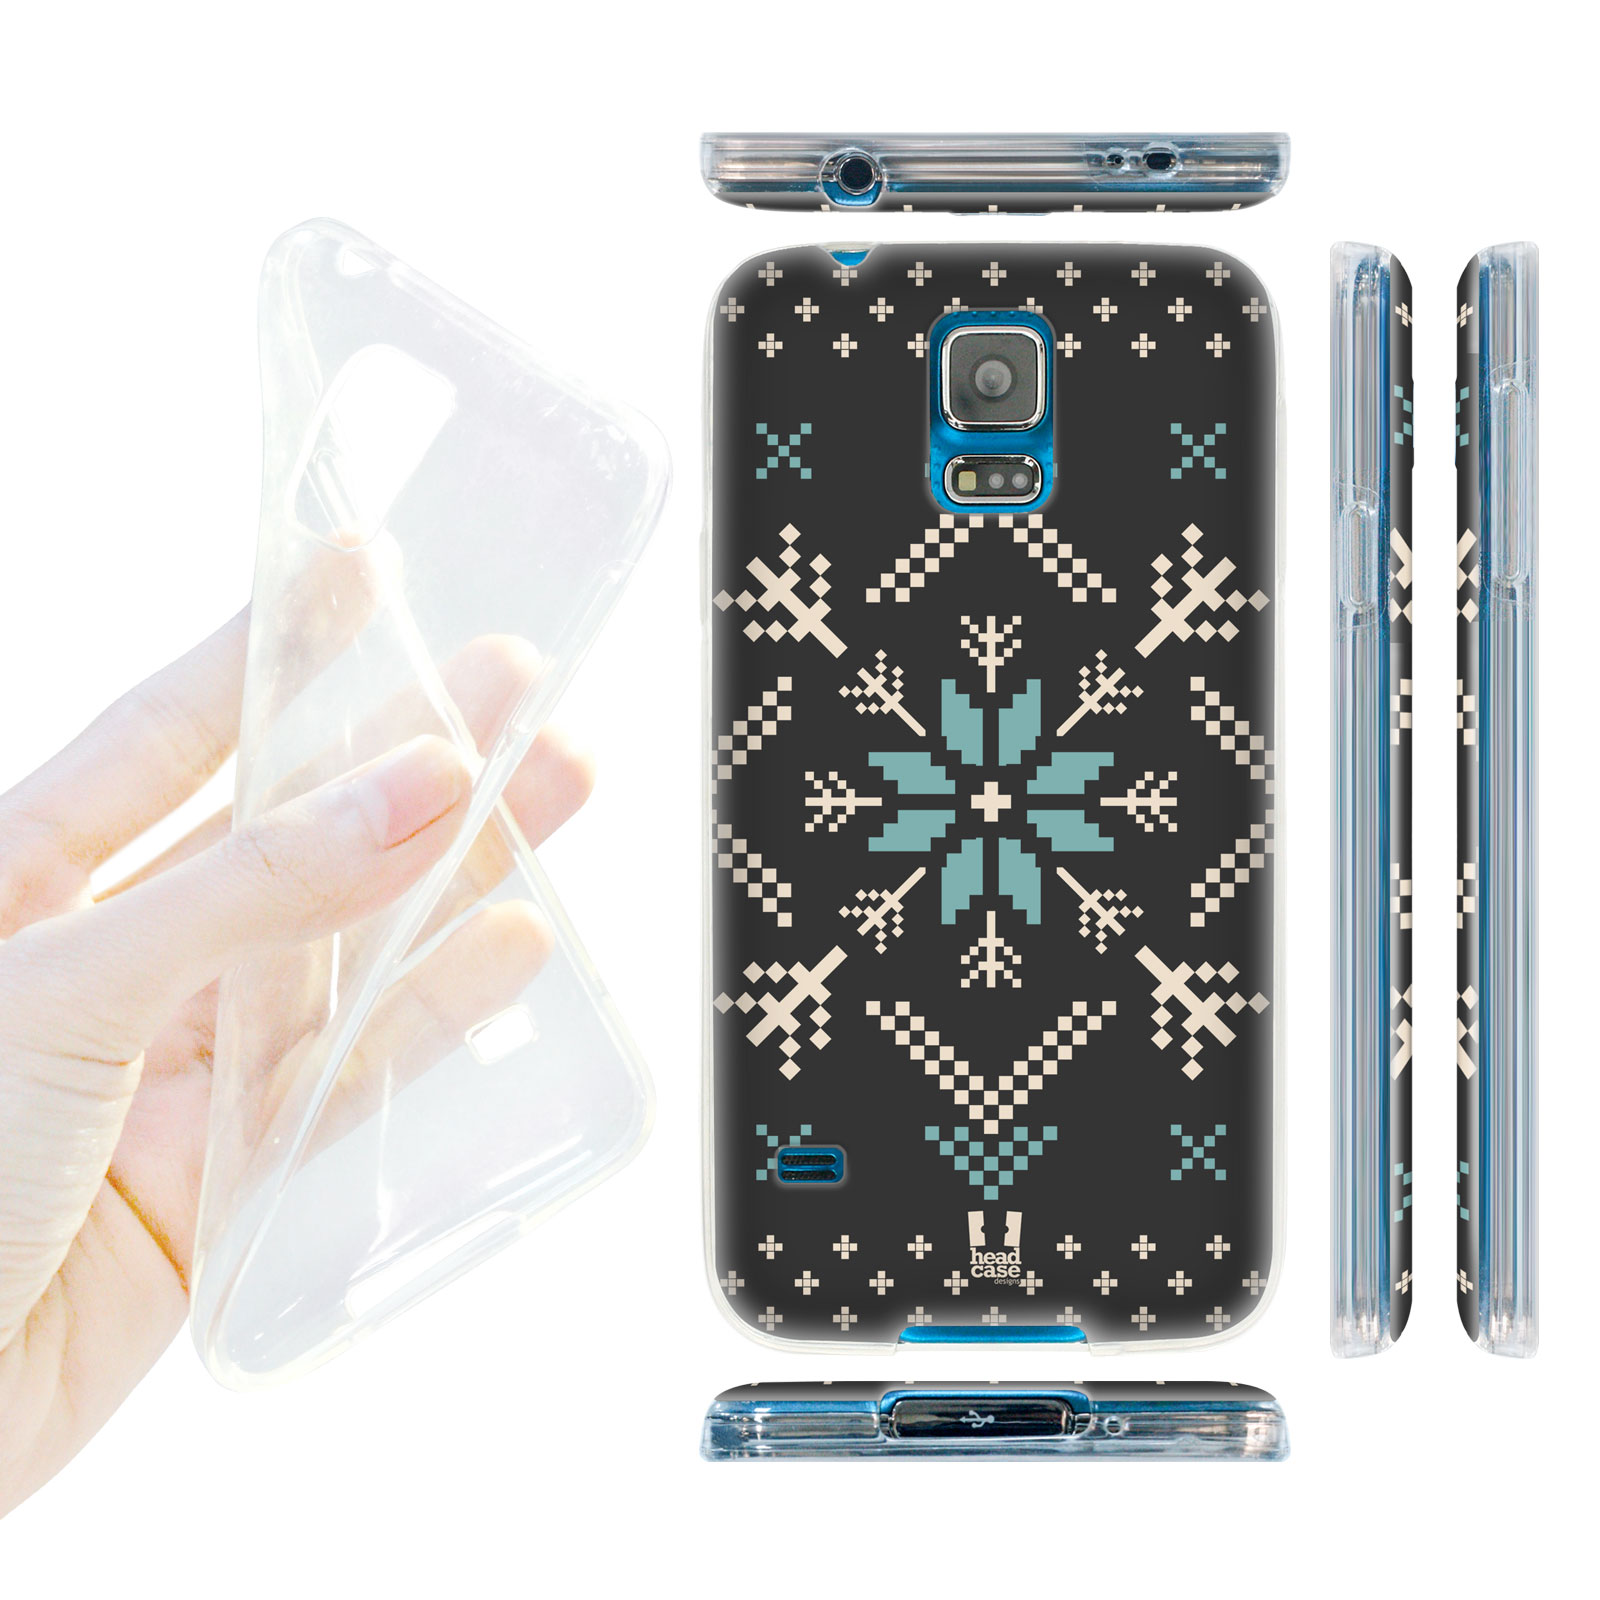 HEAD CASE silikonový obal na mobil Samsung galaxy S5 zimní motiv modrá vločka